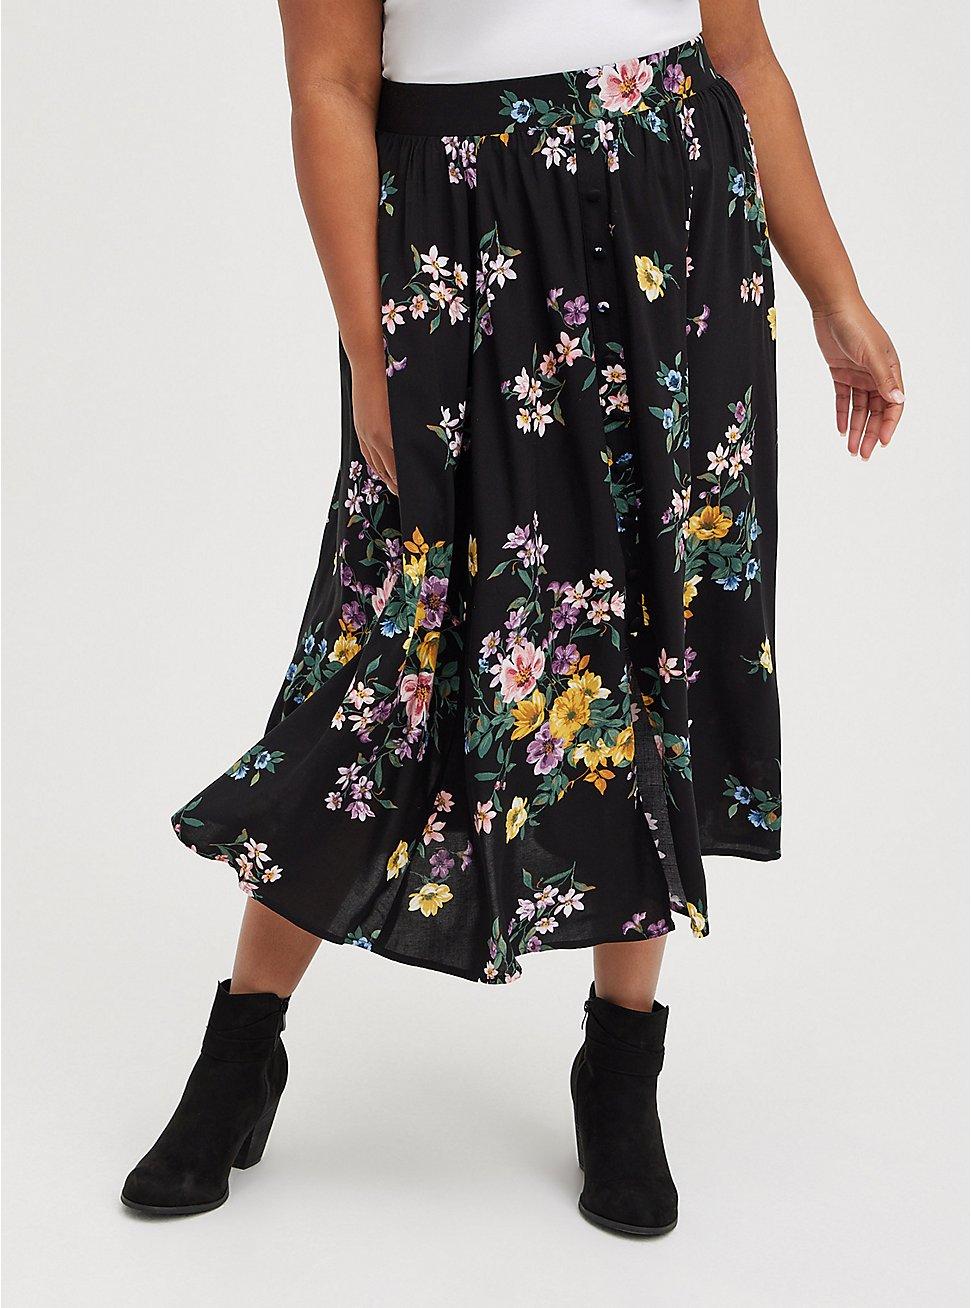 Button Front Tea Length Skirt - Challis Floral Black, FLORAL - BLACK, hi-res